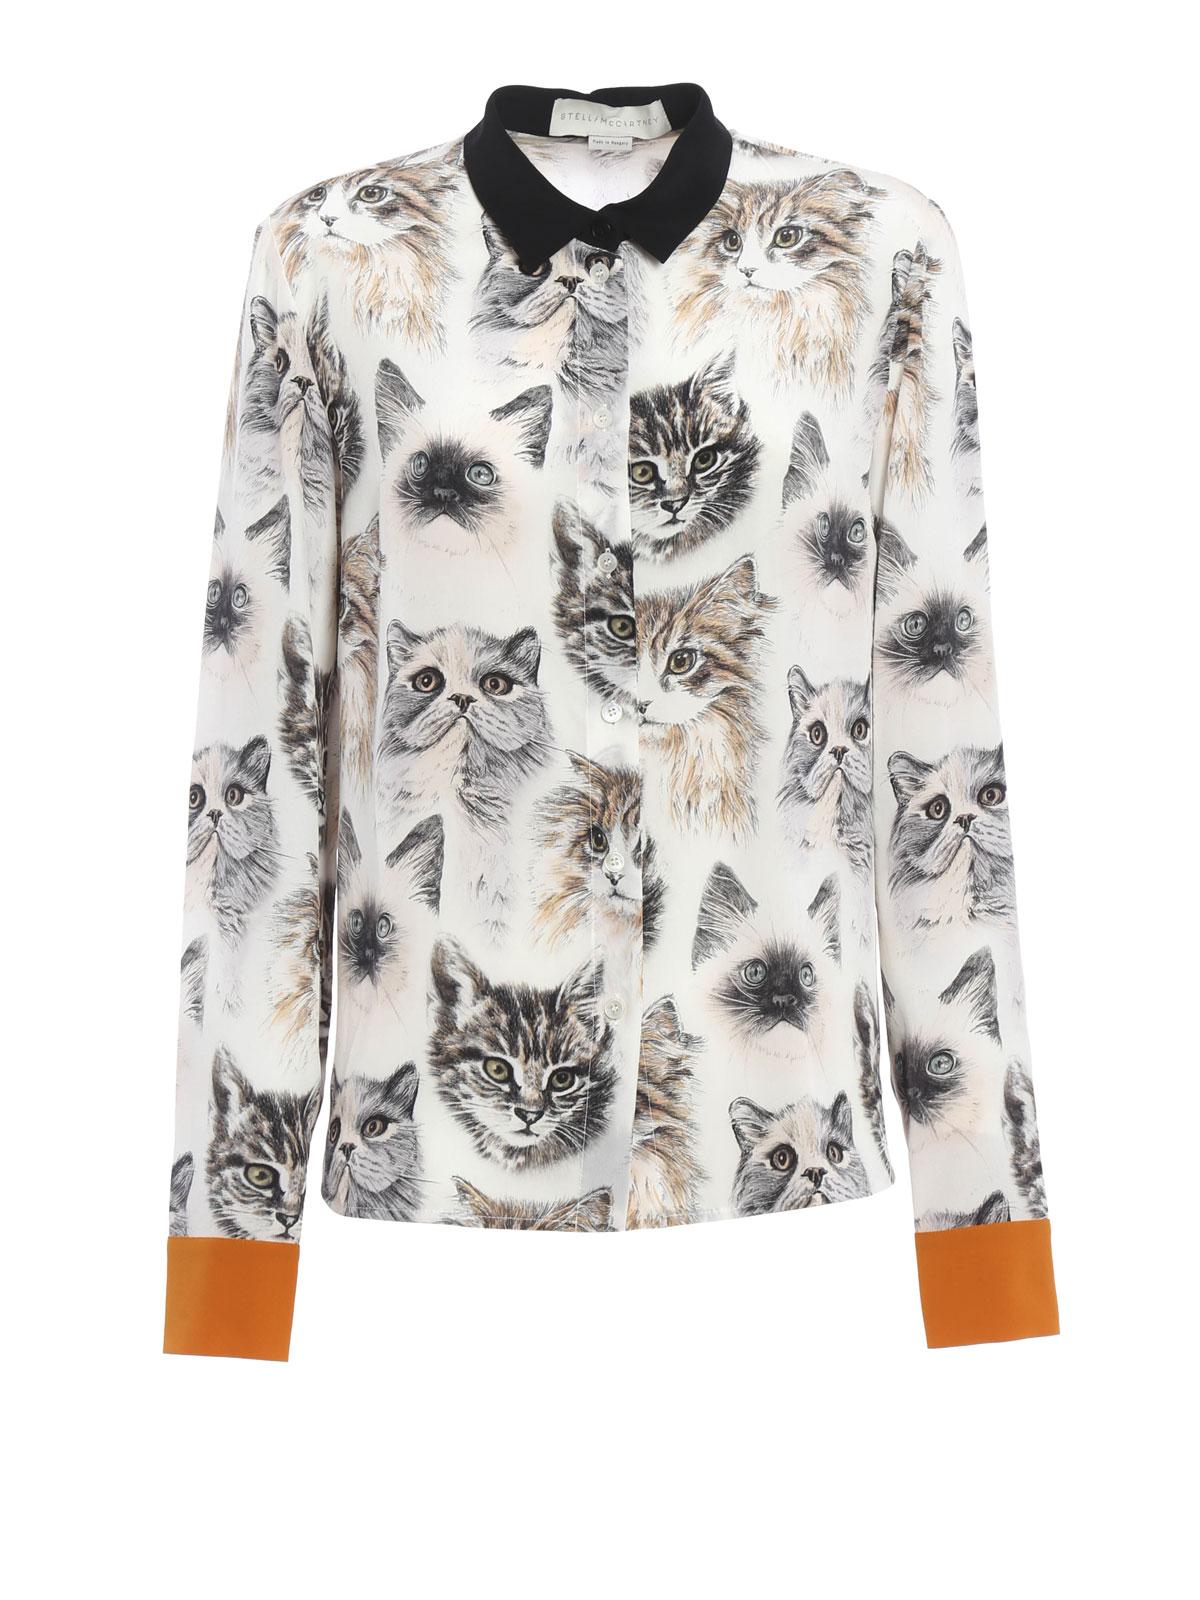 online store 862af 01eff Stella Mccartney - Camicia in seta con stampa gatti ...